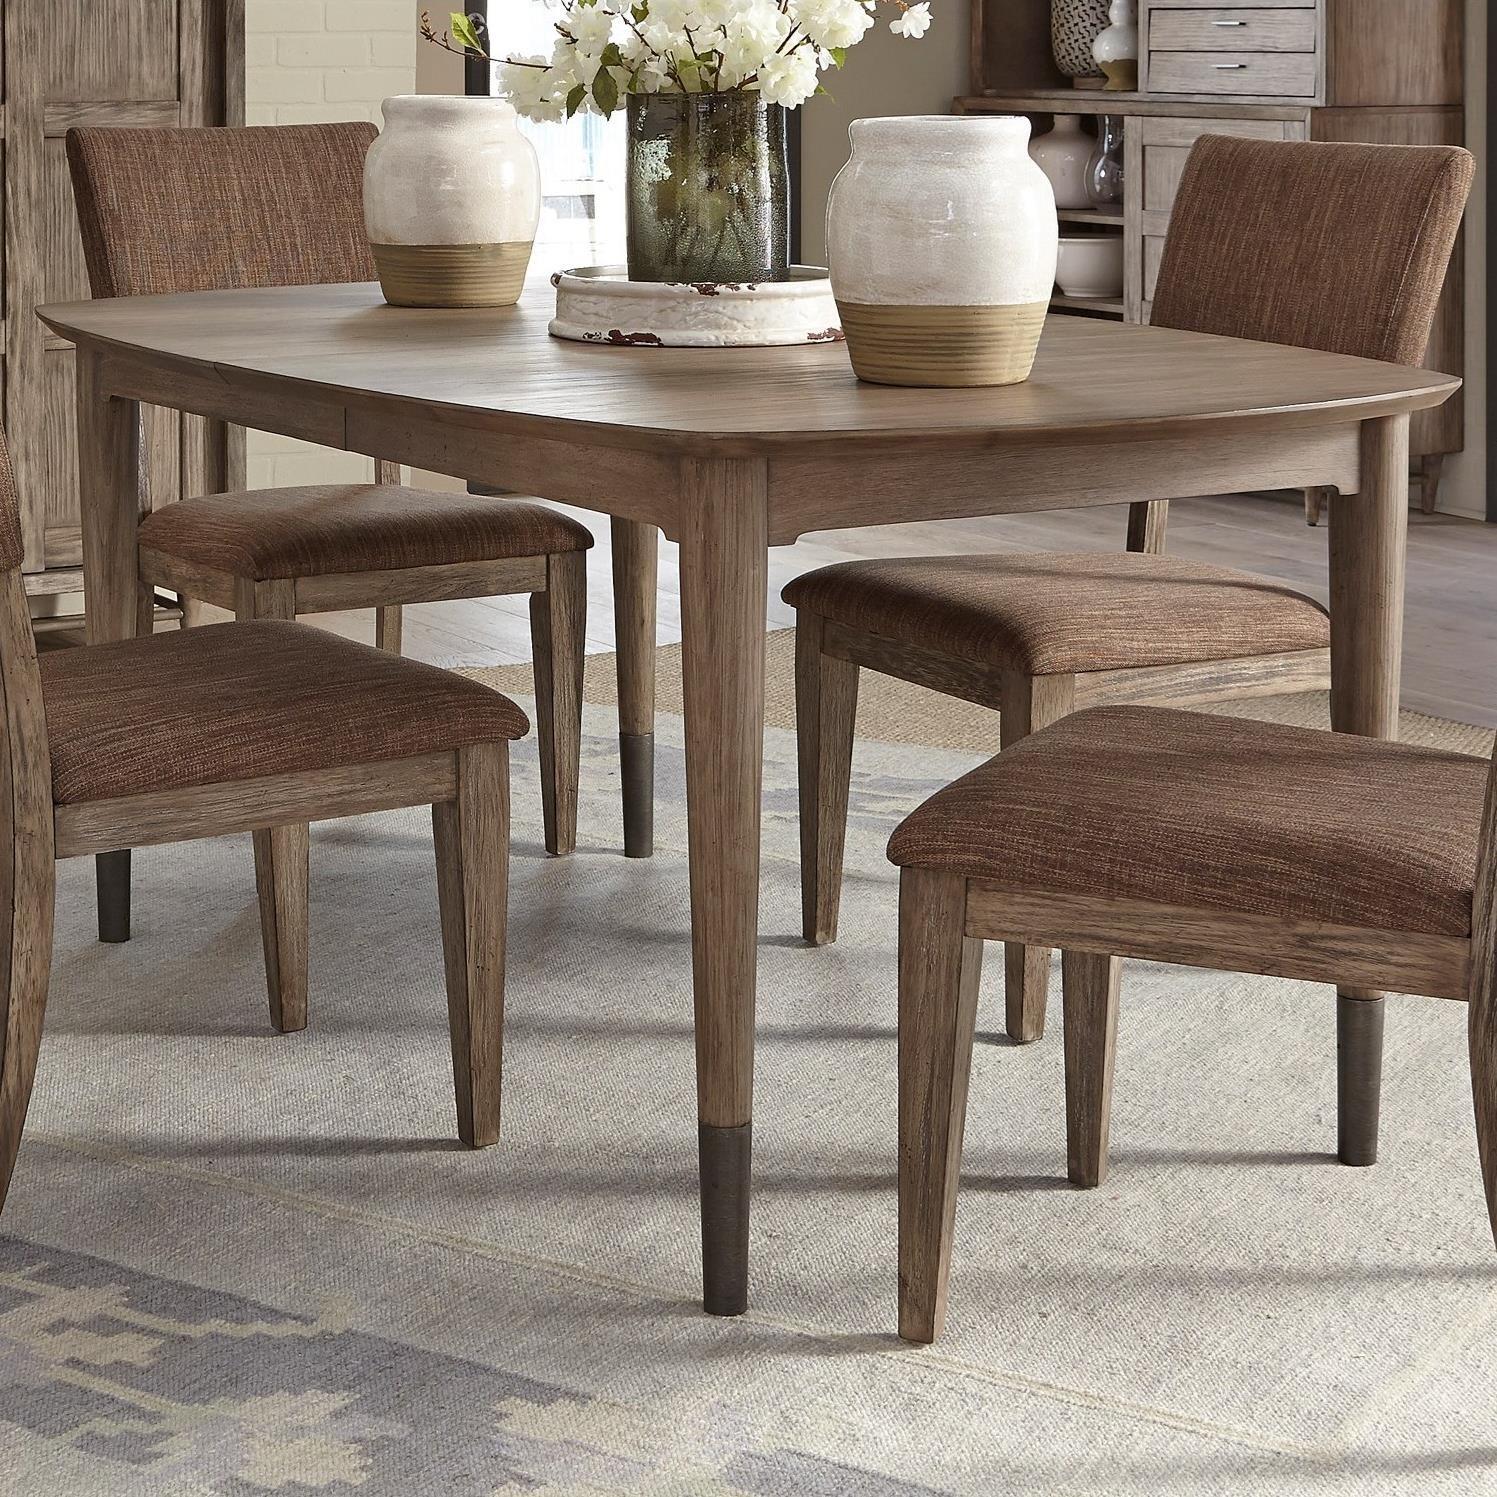 Liberty Furniture Miramar Oval Leg Table With Leaf